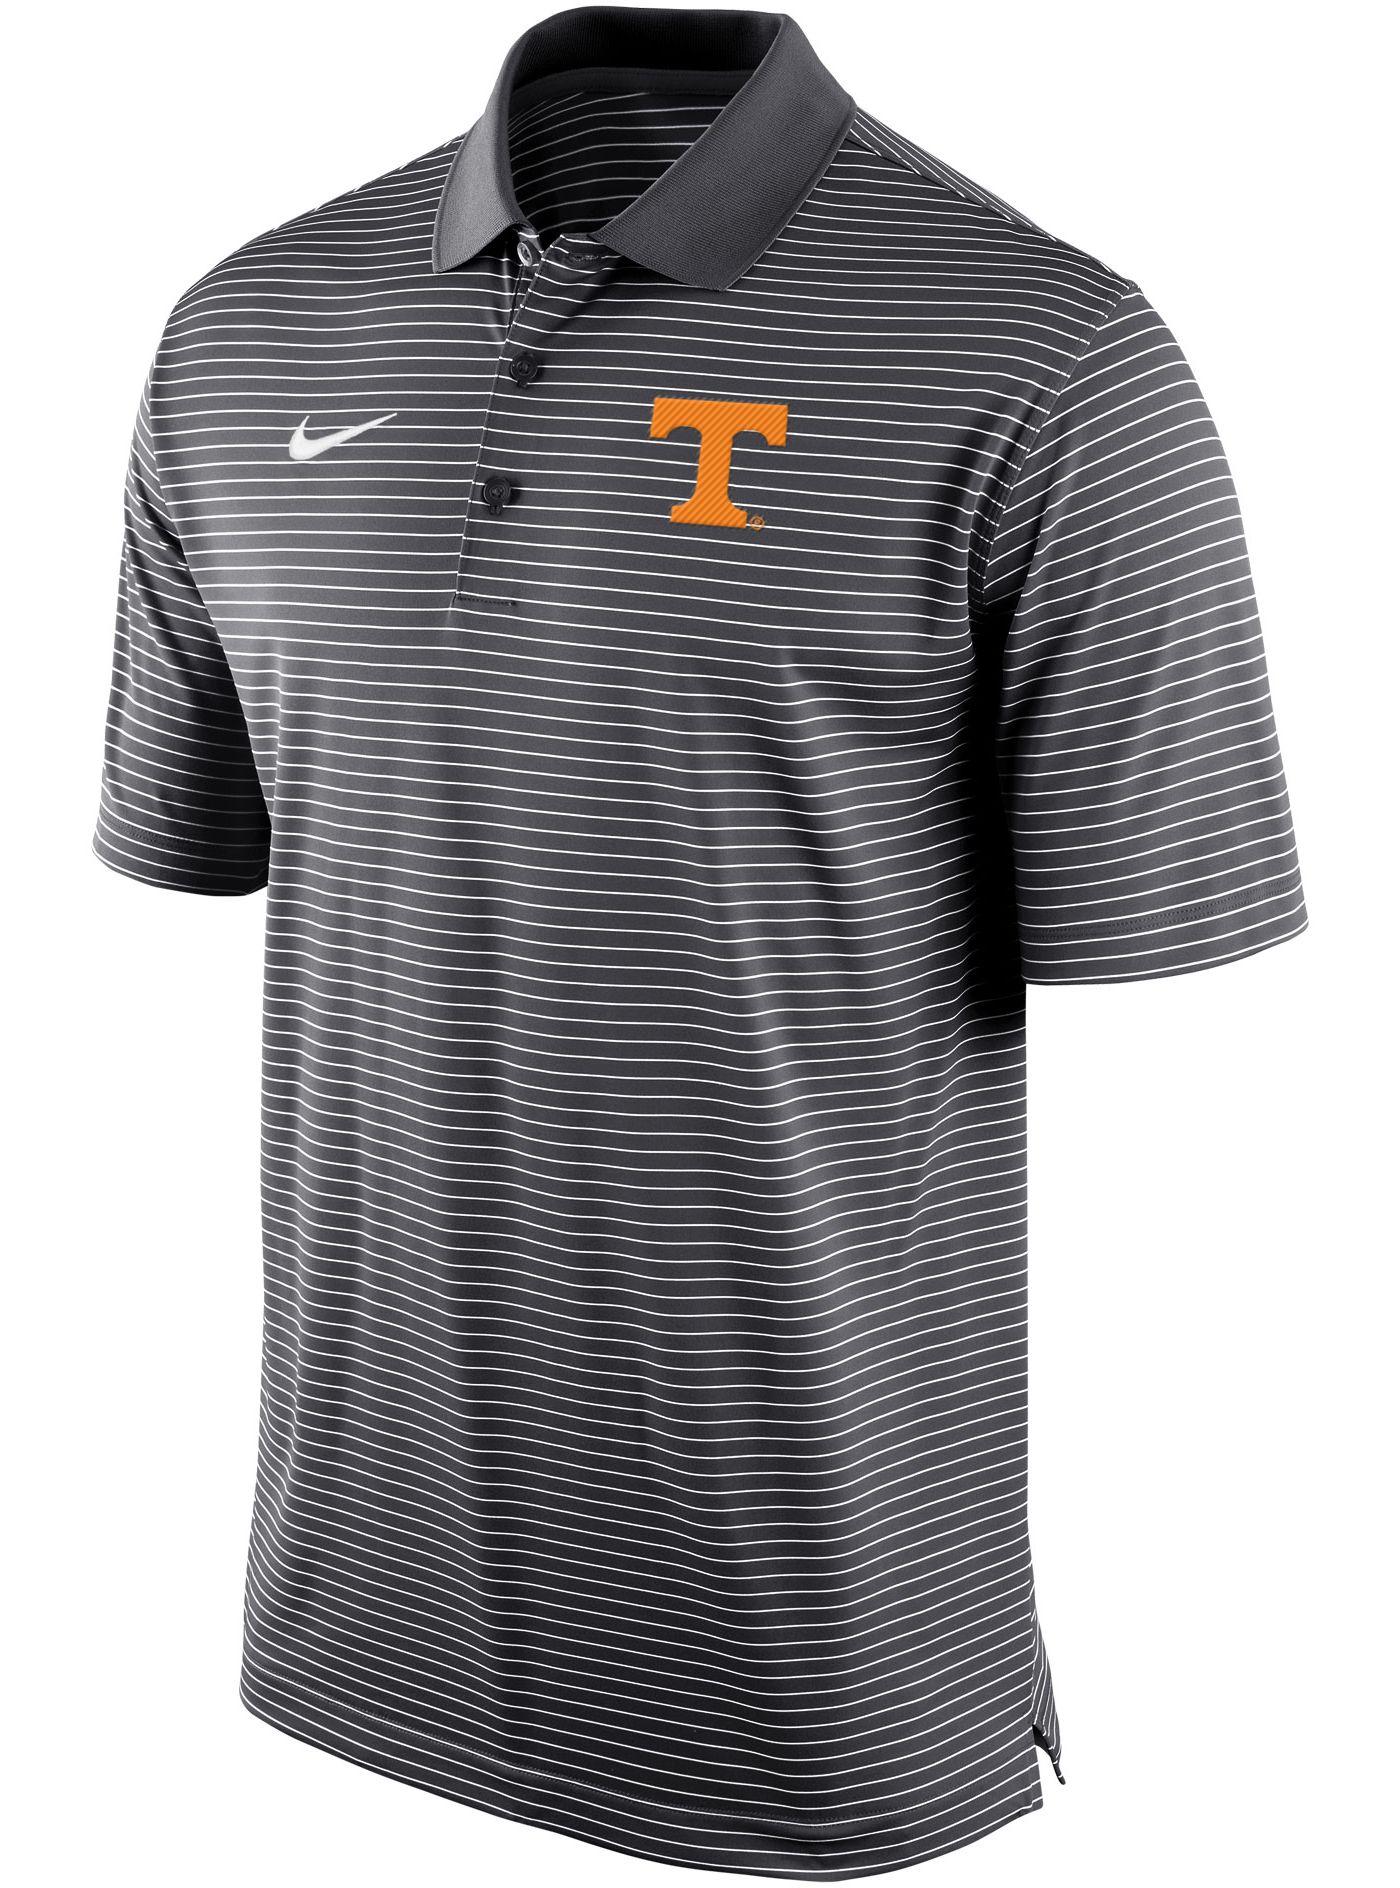 Nike Men's Tennessee Volunteers Grey Stadium Striped Polo